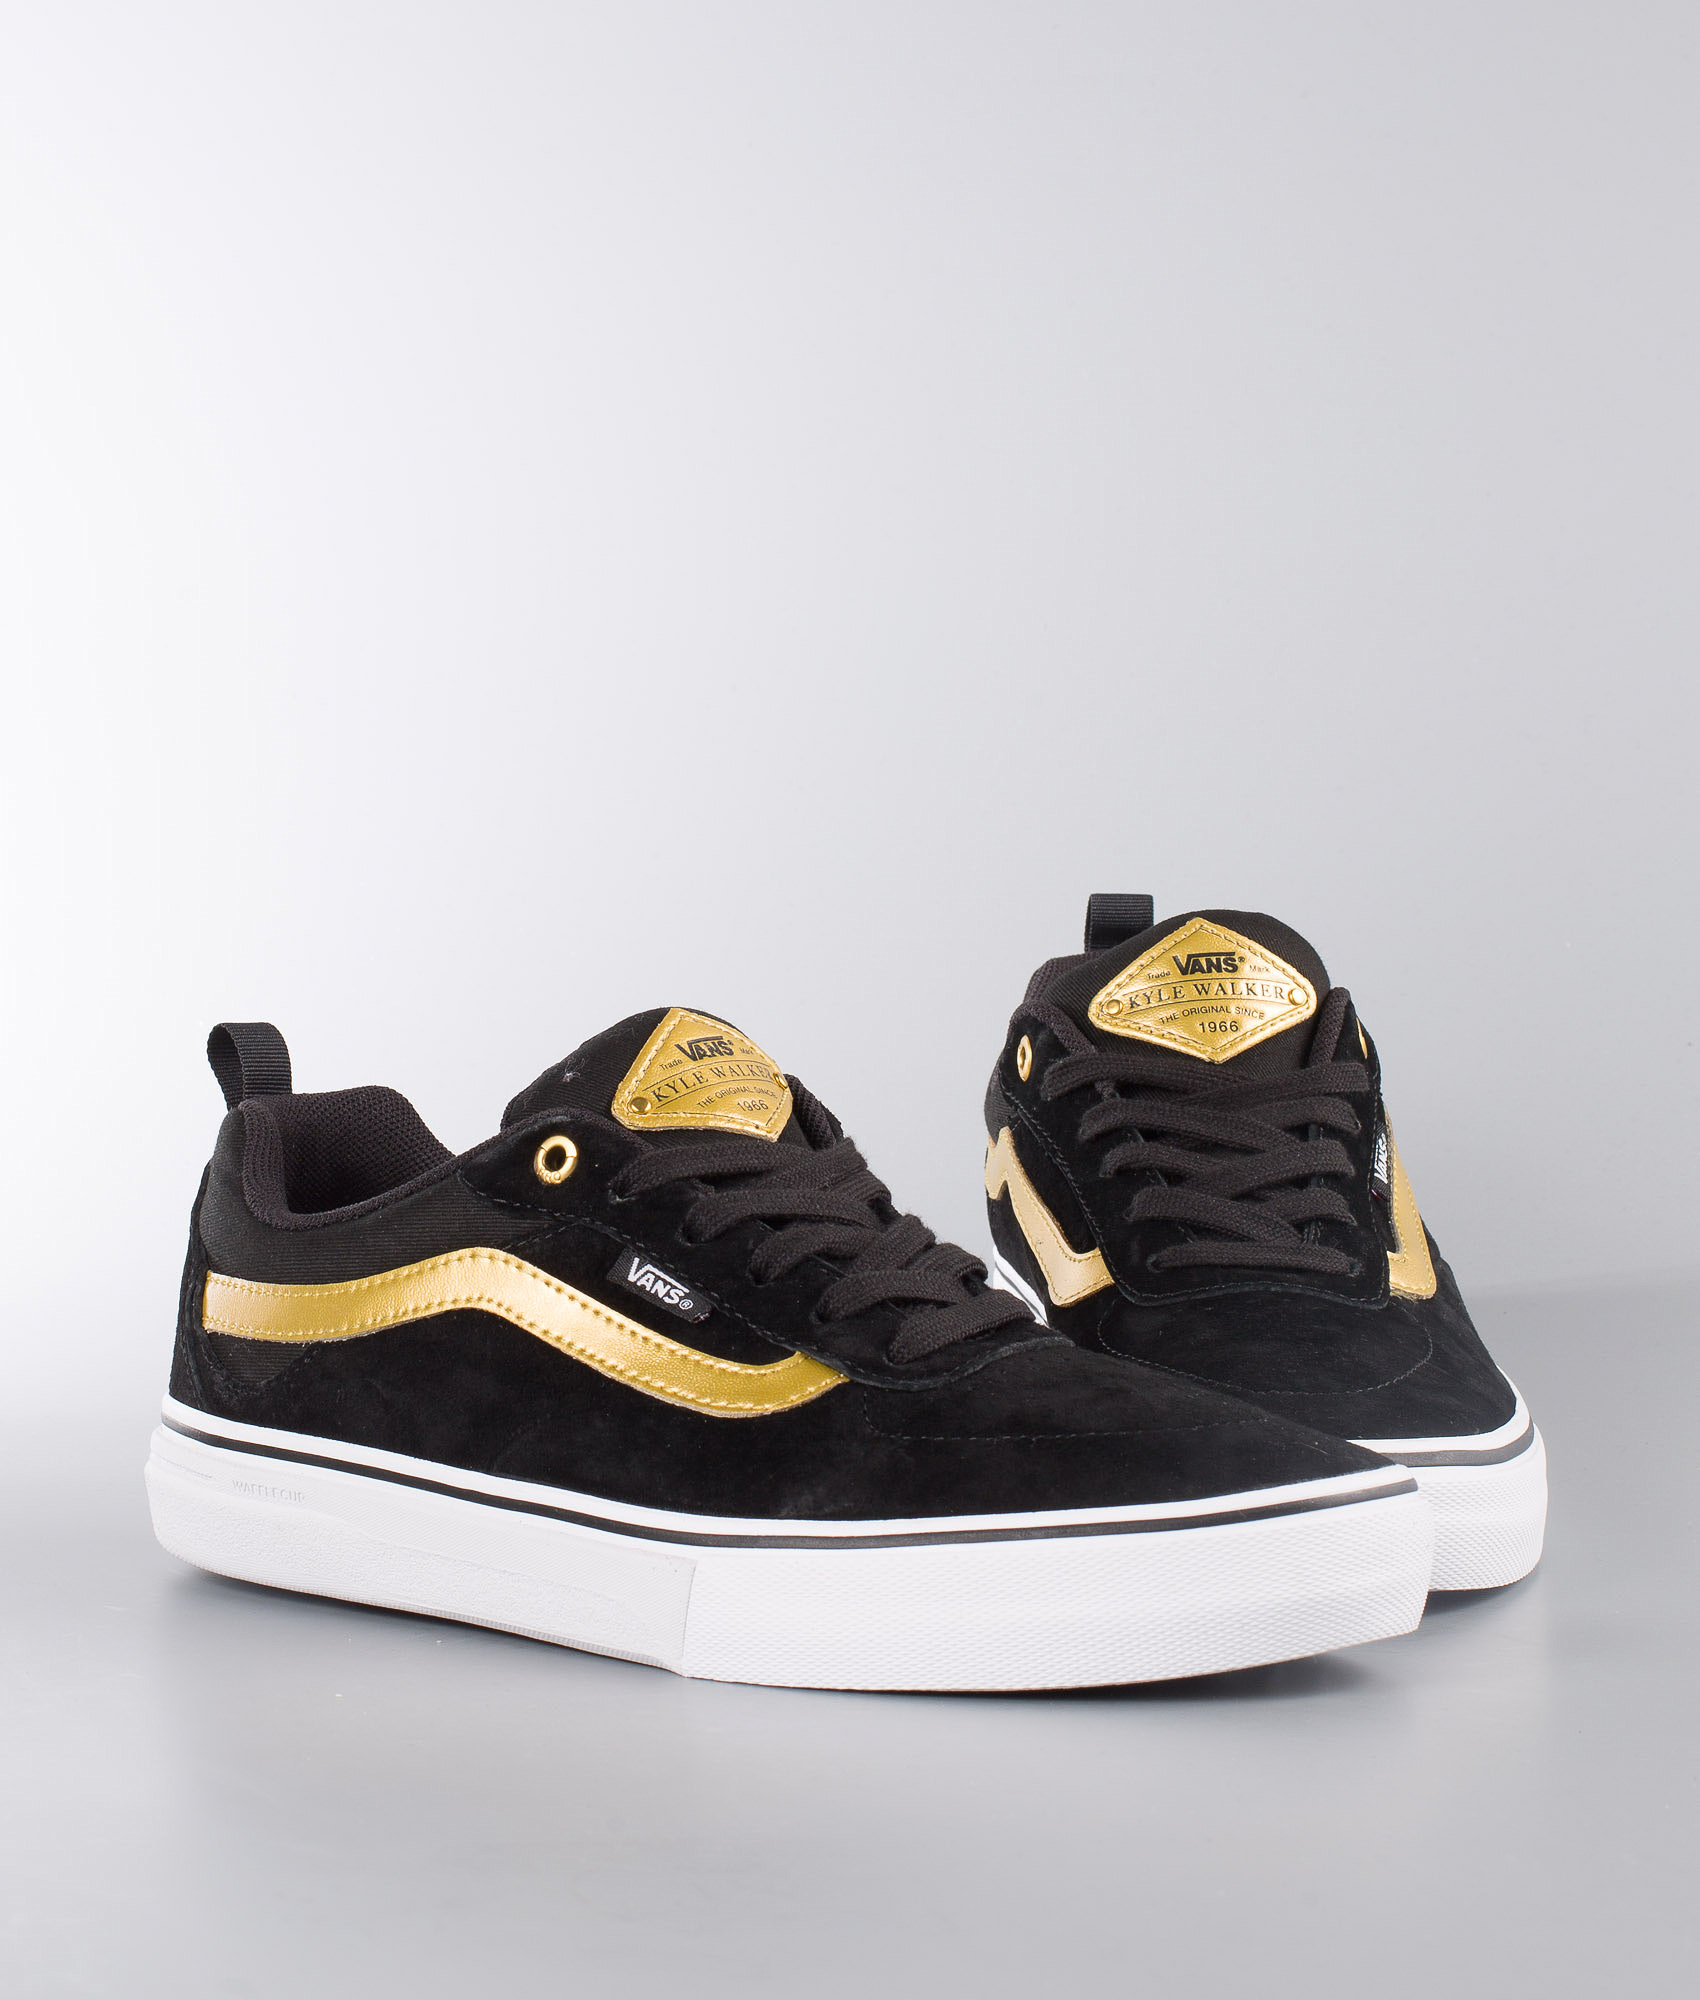 7635ad300036 Vans Kyle Walker Pro Shoes Black Metallic Gold - Ridestore.com